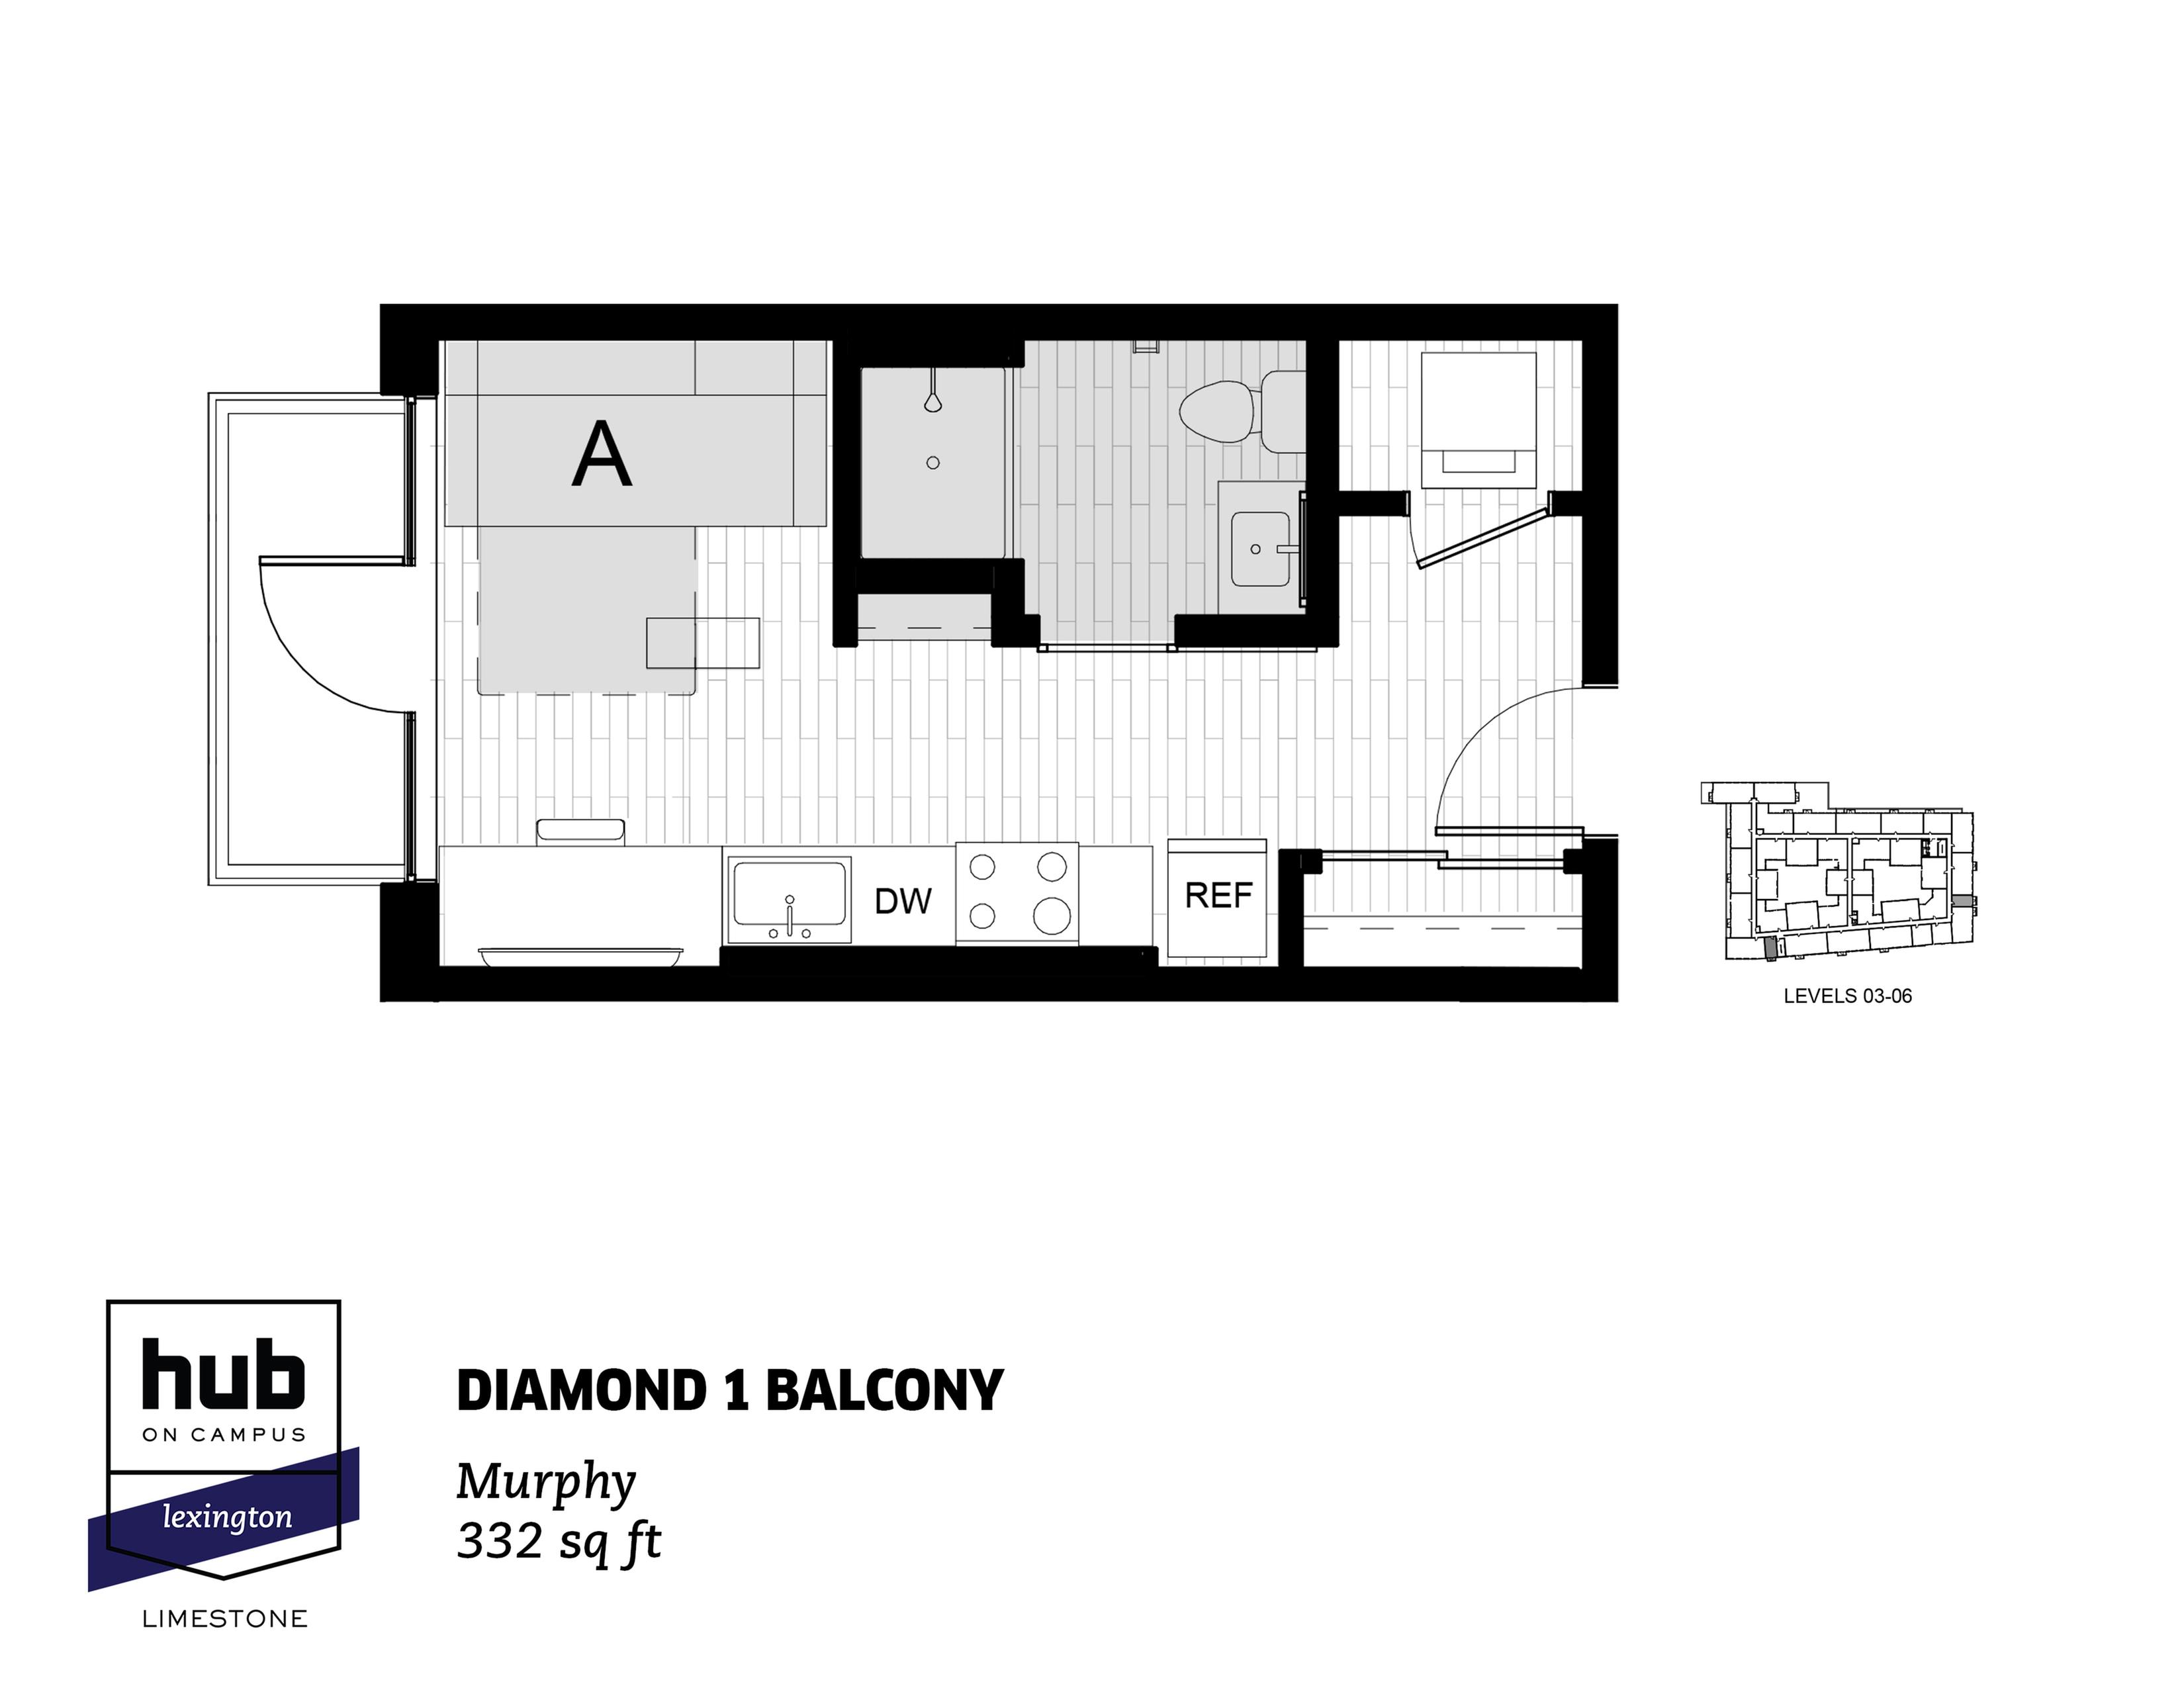 Diamond 1 Balcony